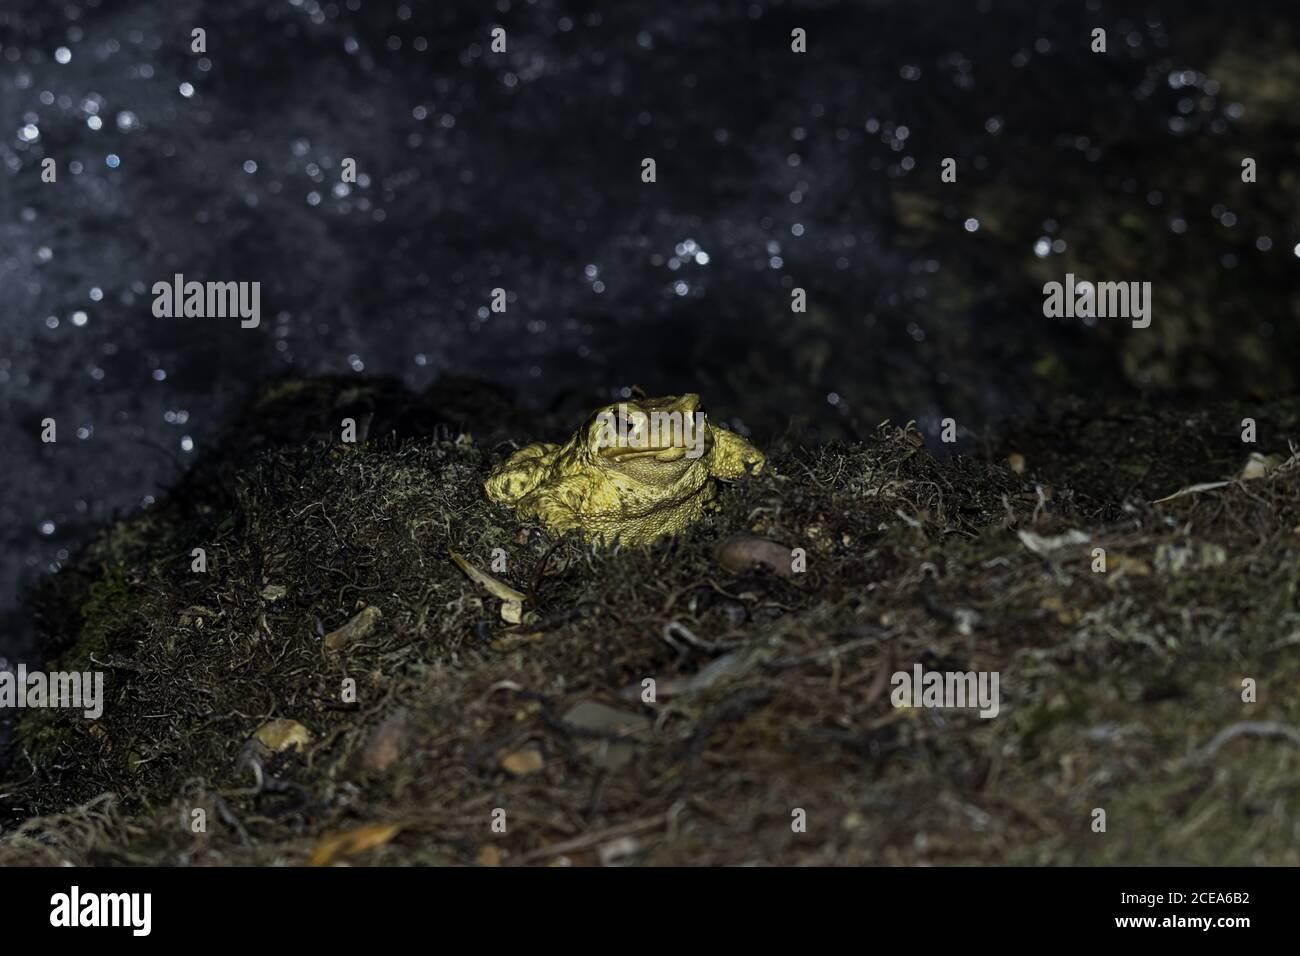 Primer plano de un sapo amarillo con ojos rojos abultados sobre un fondo borroso Foto de stock